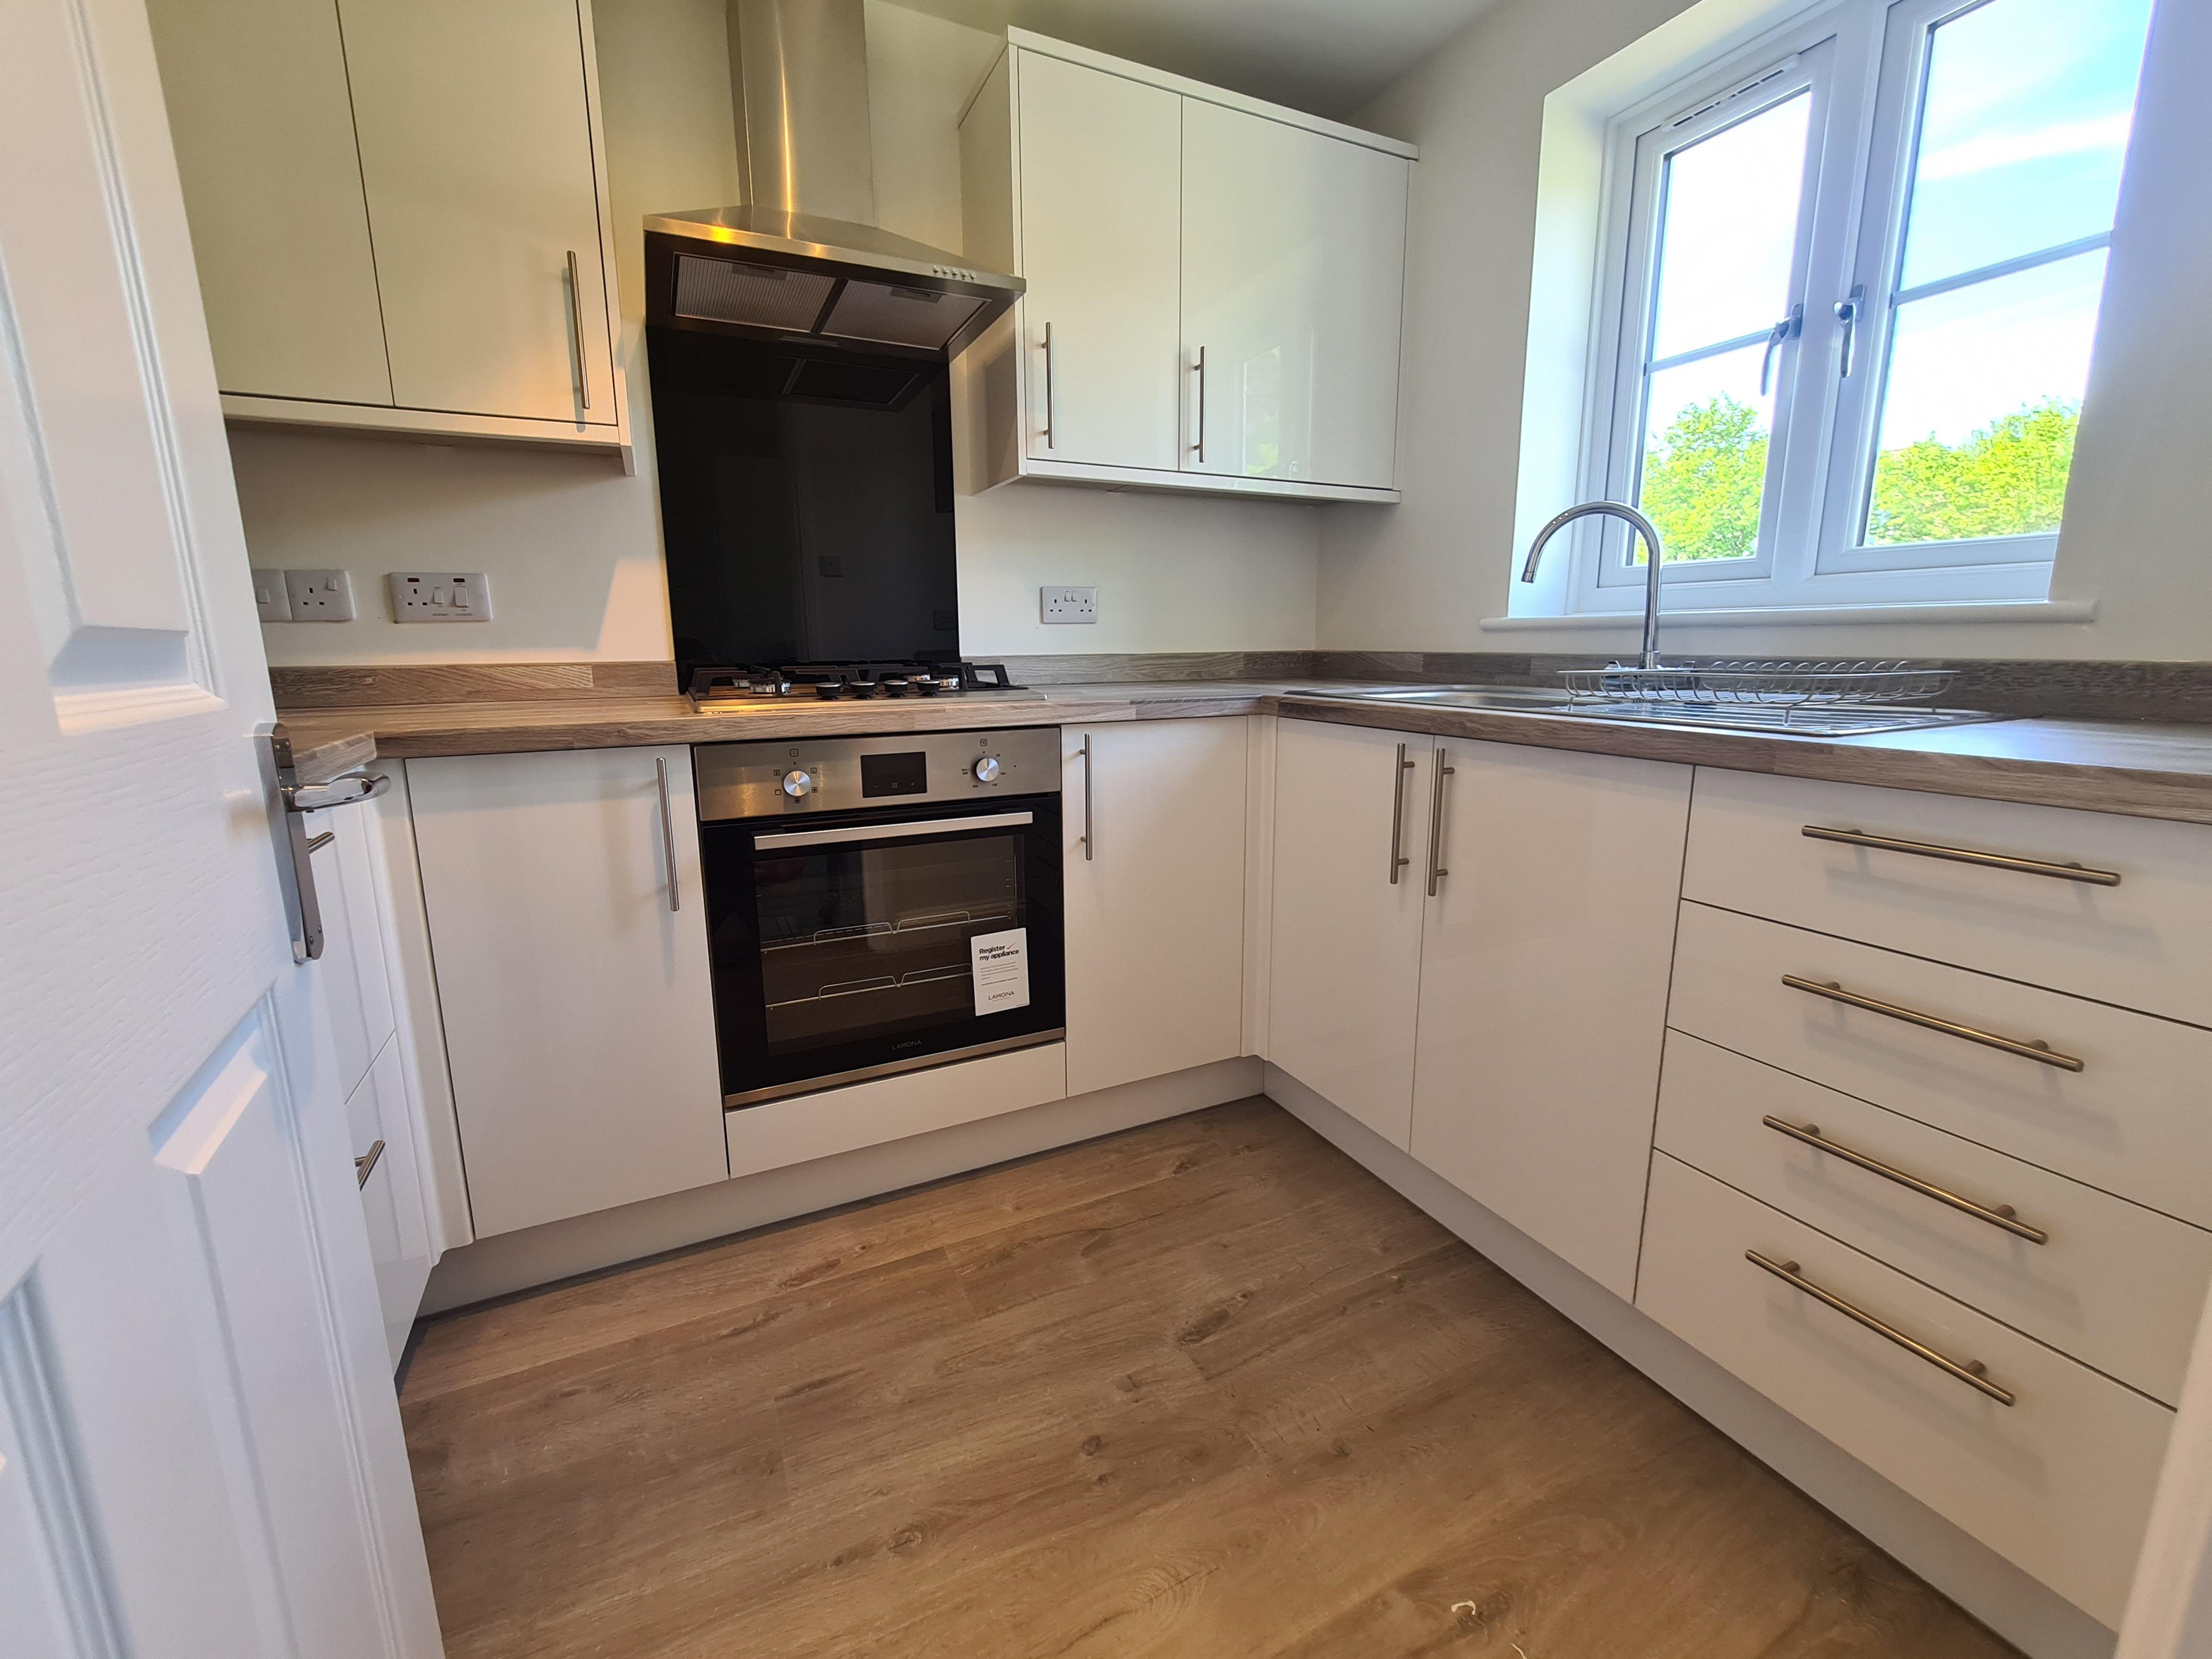 Perfect rental kitchen